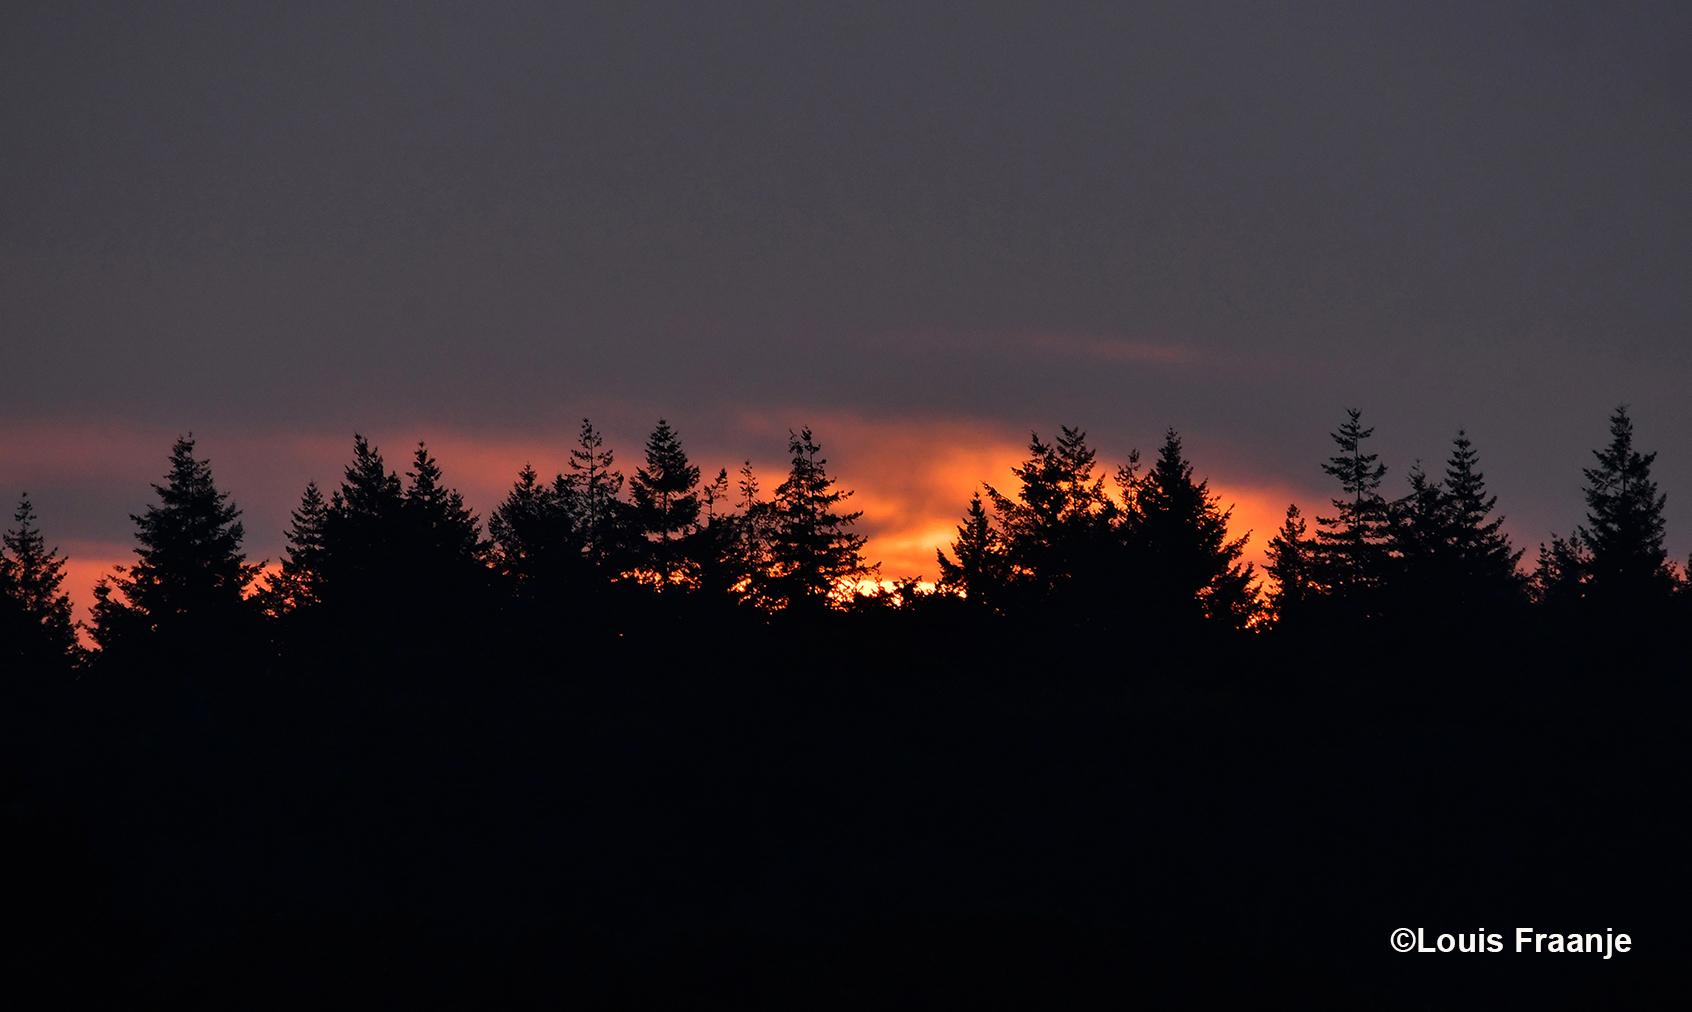 Kortstondig ochtendgloren - Foto: ©Louis Fraanje